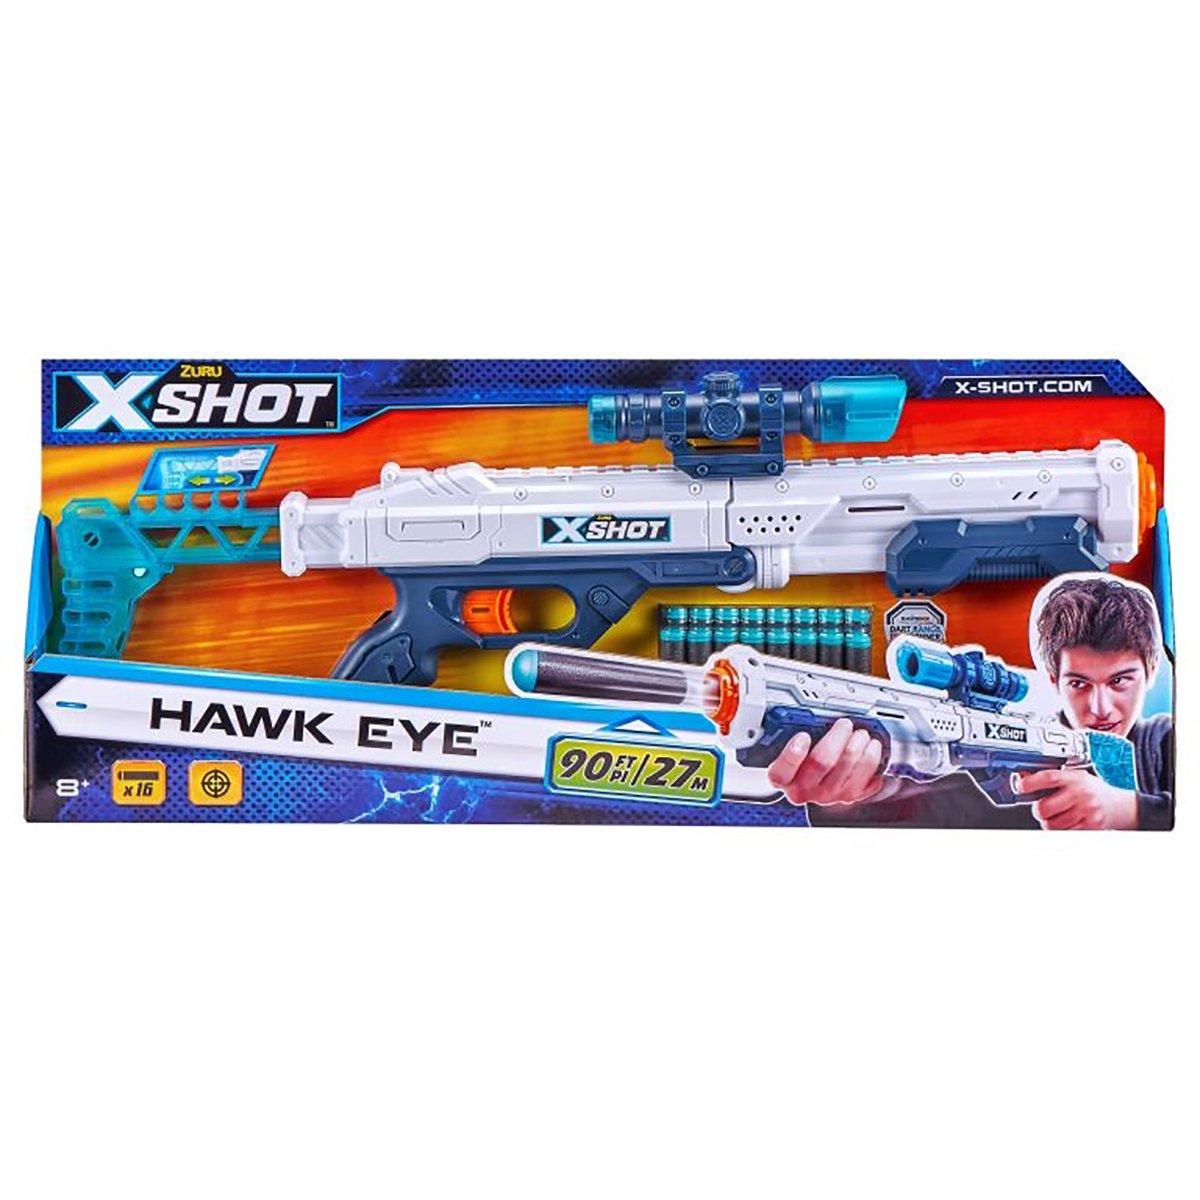 Blaster X-Shot Excel Hawk Eye, 16 proiectile